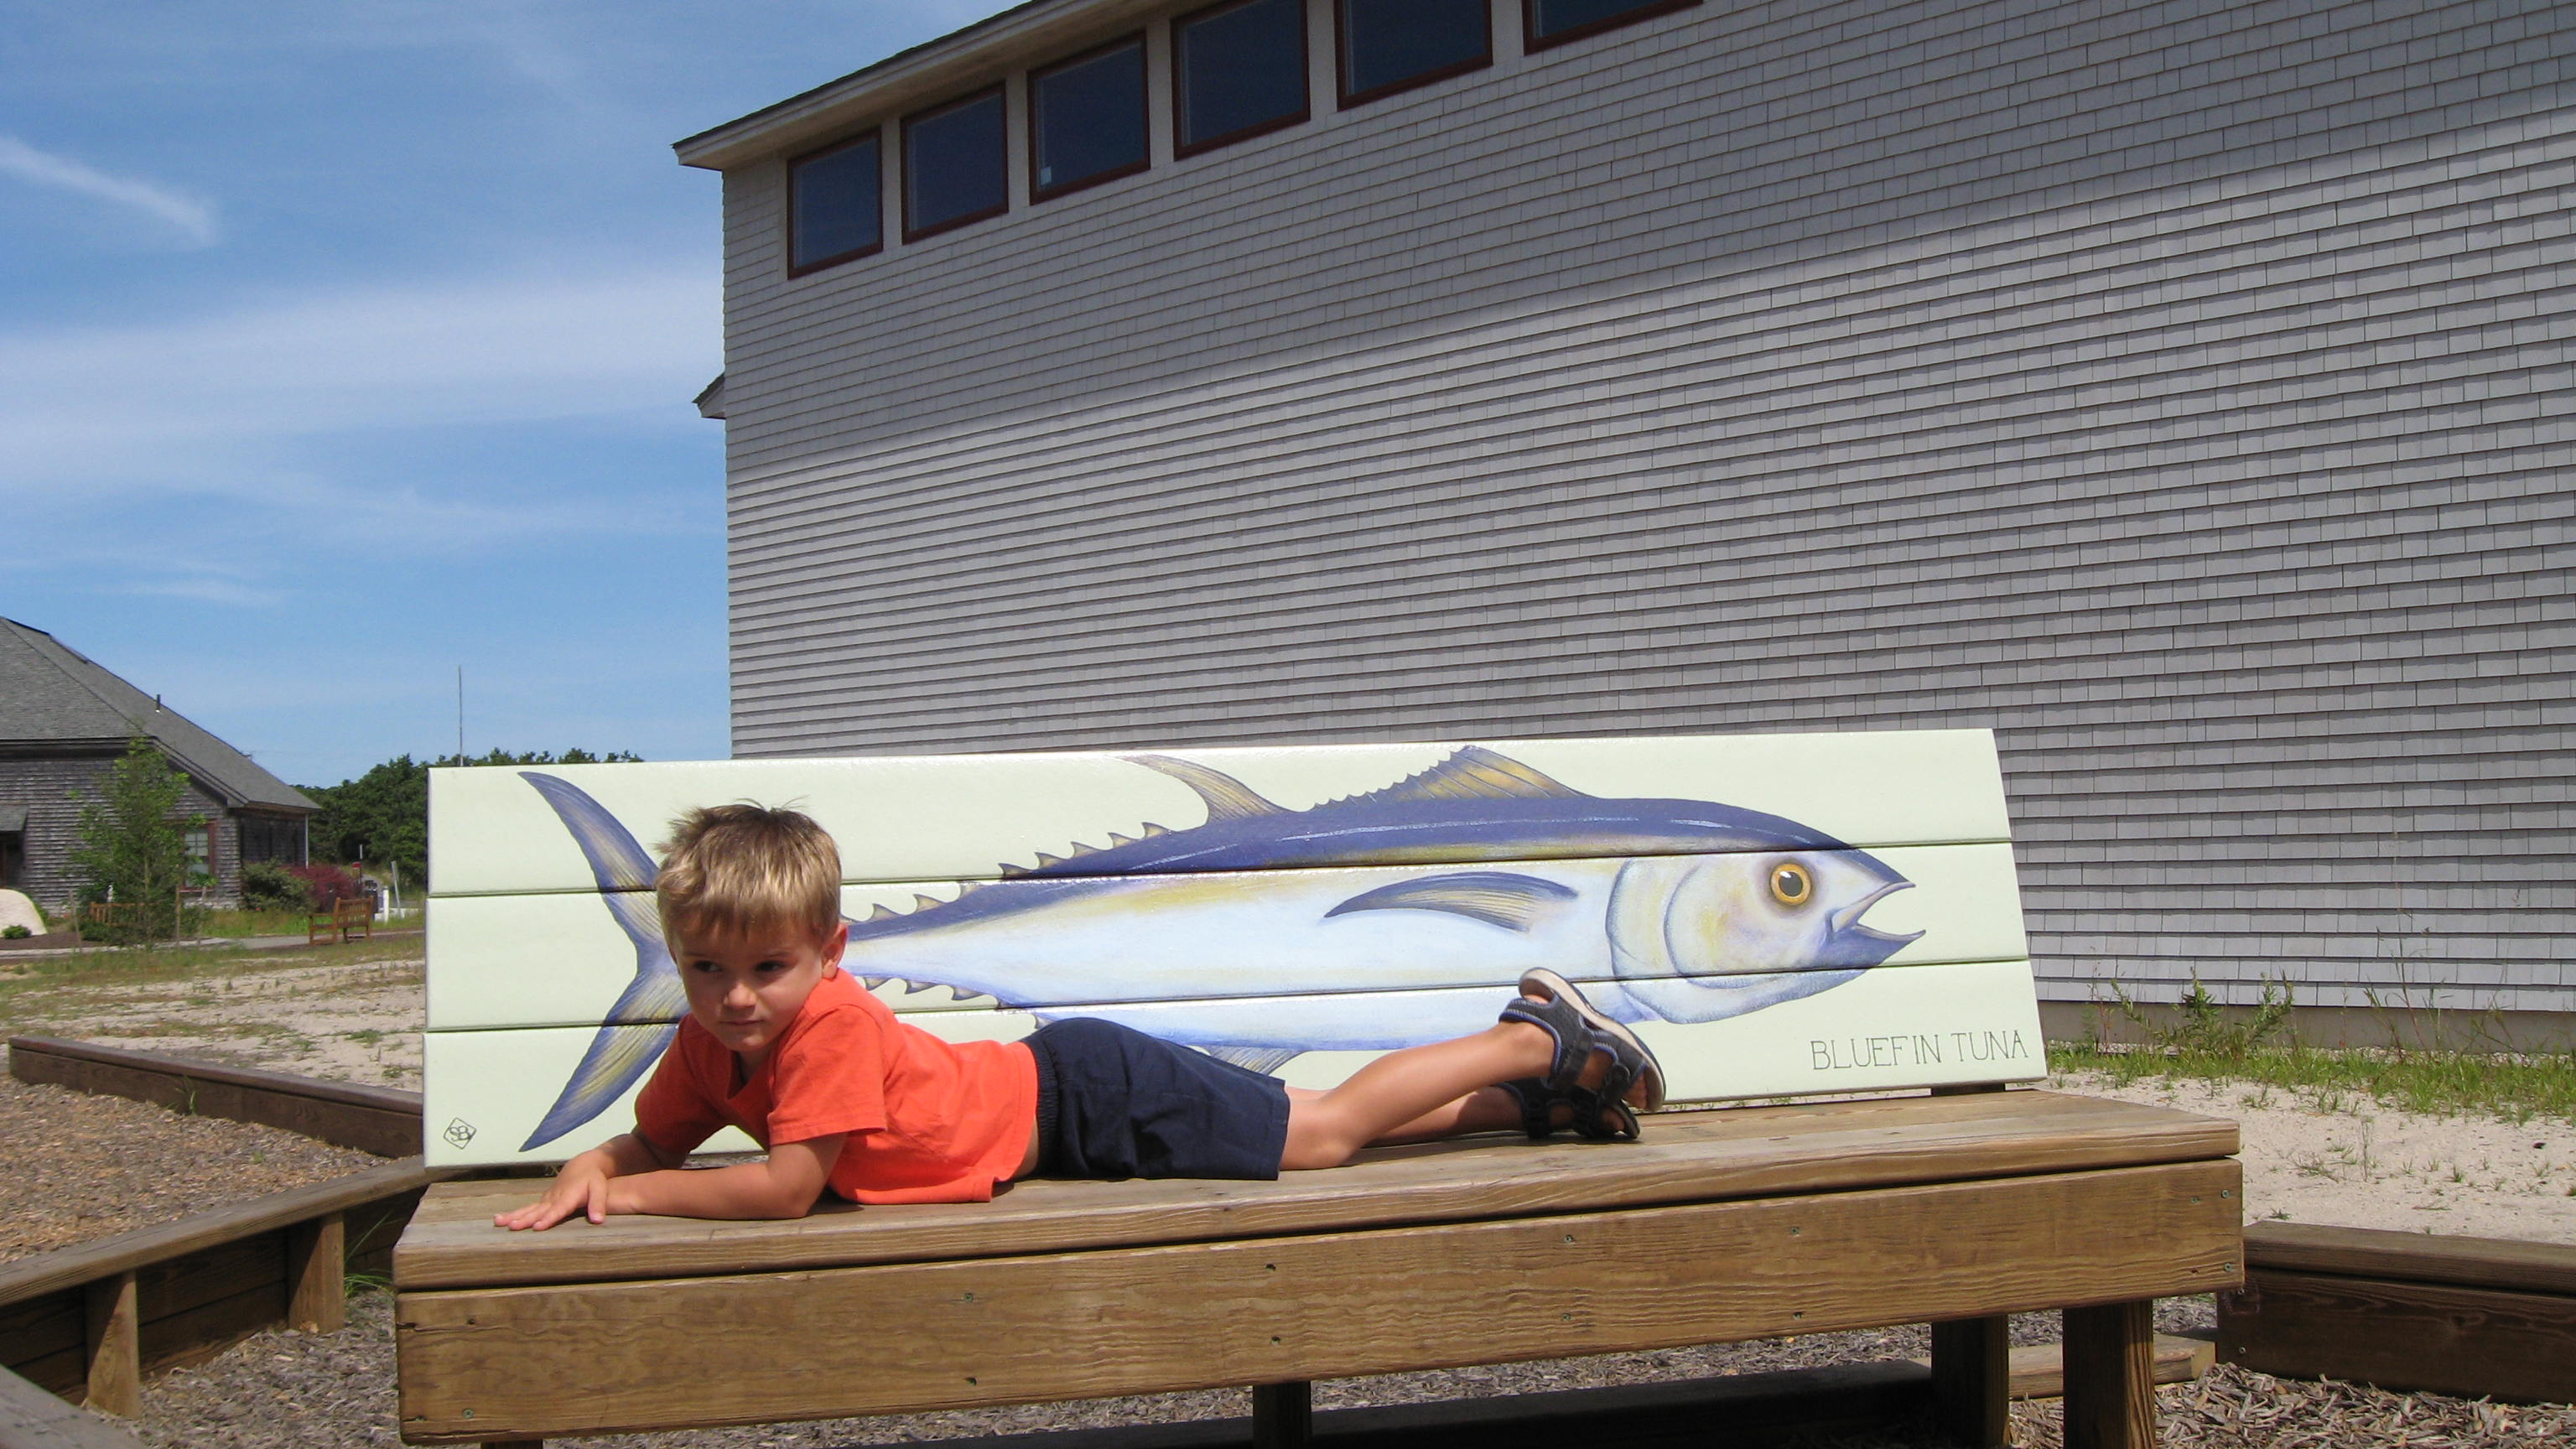 resting, alongside a bluefin